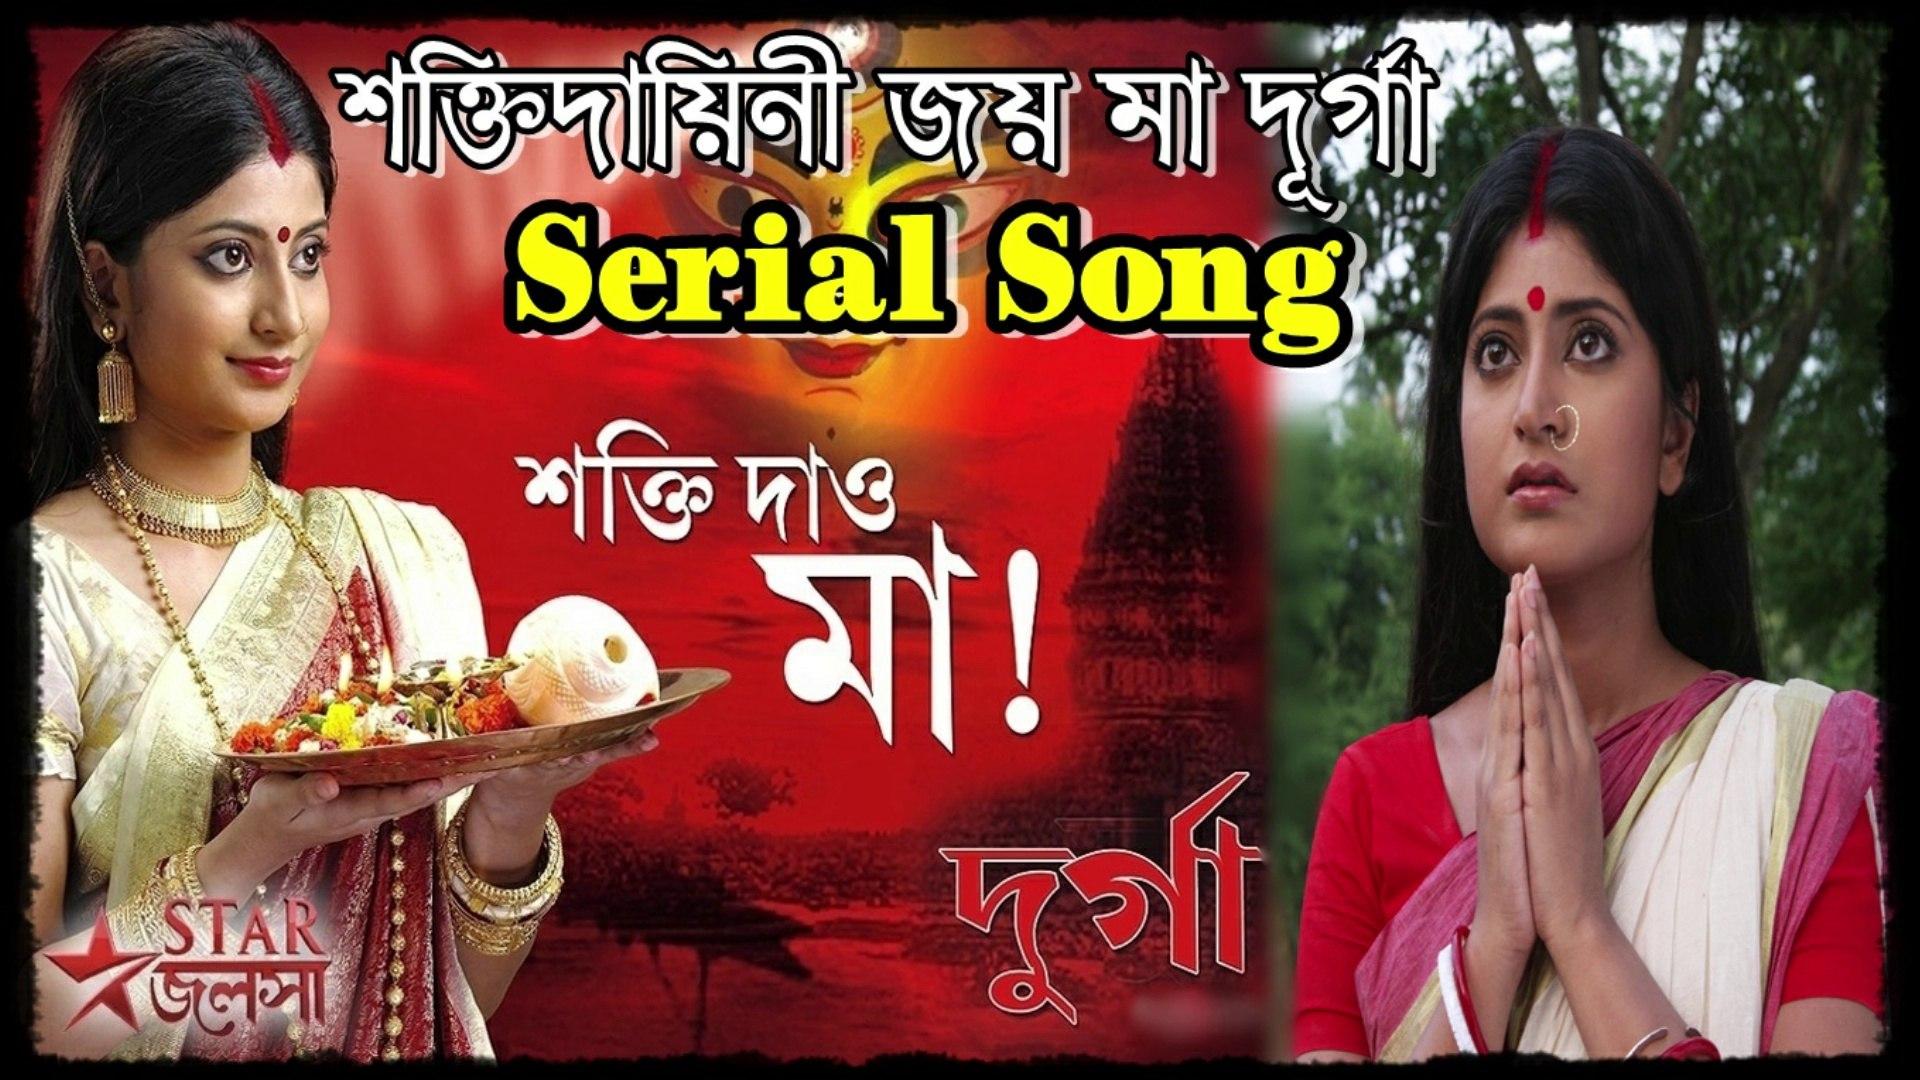 Durga (দূর্গা) Serial Song By Star Jalsa With Lyrics